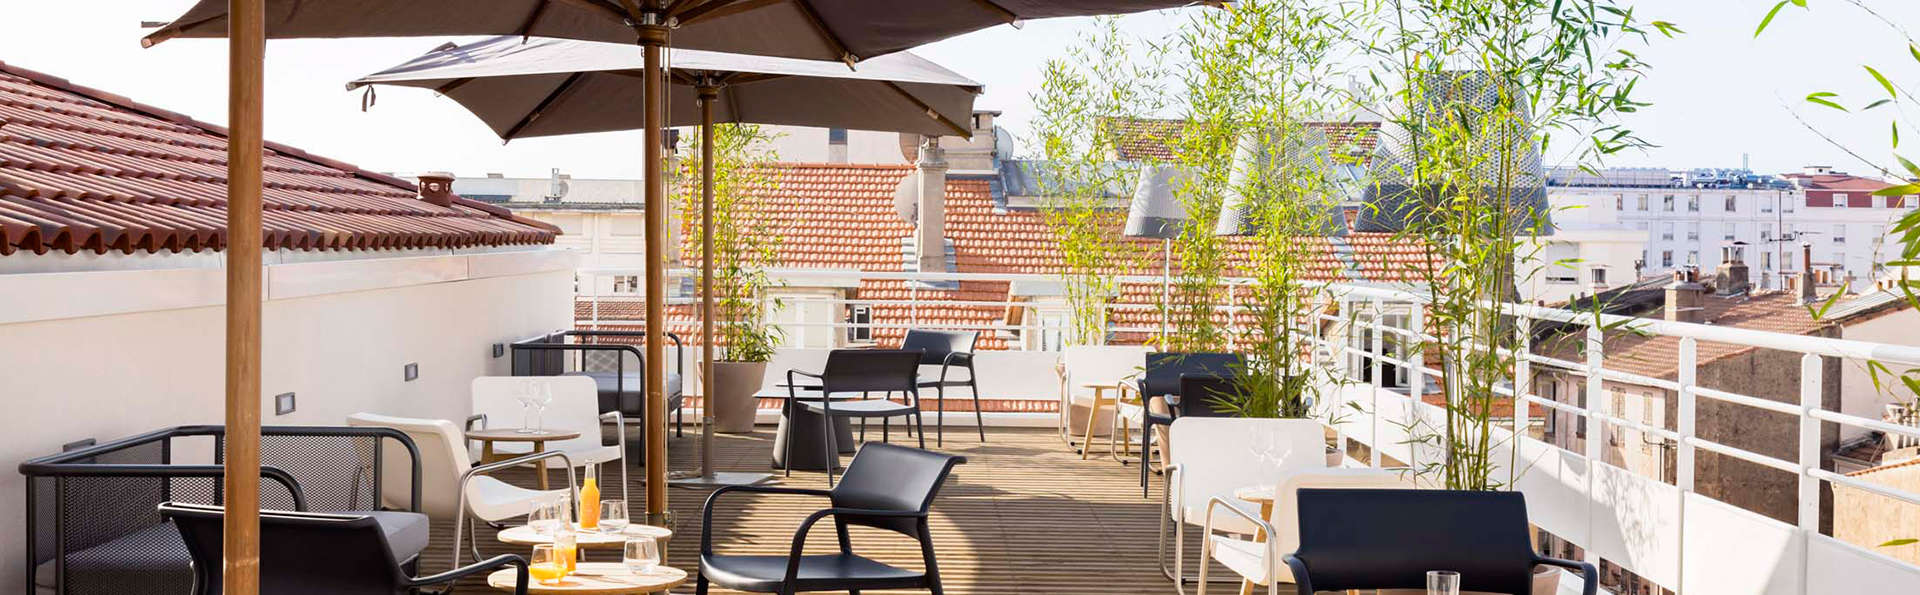 Okko Hotels Cannes - edit_terrace.jpg